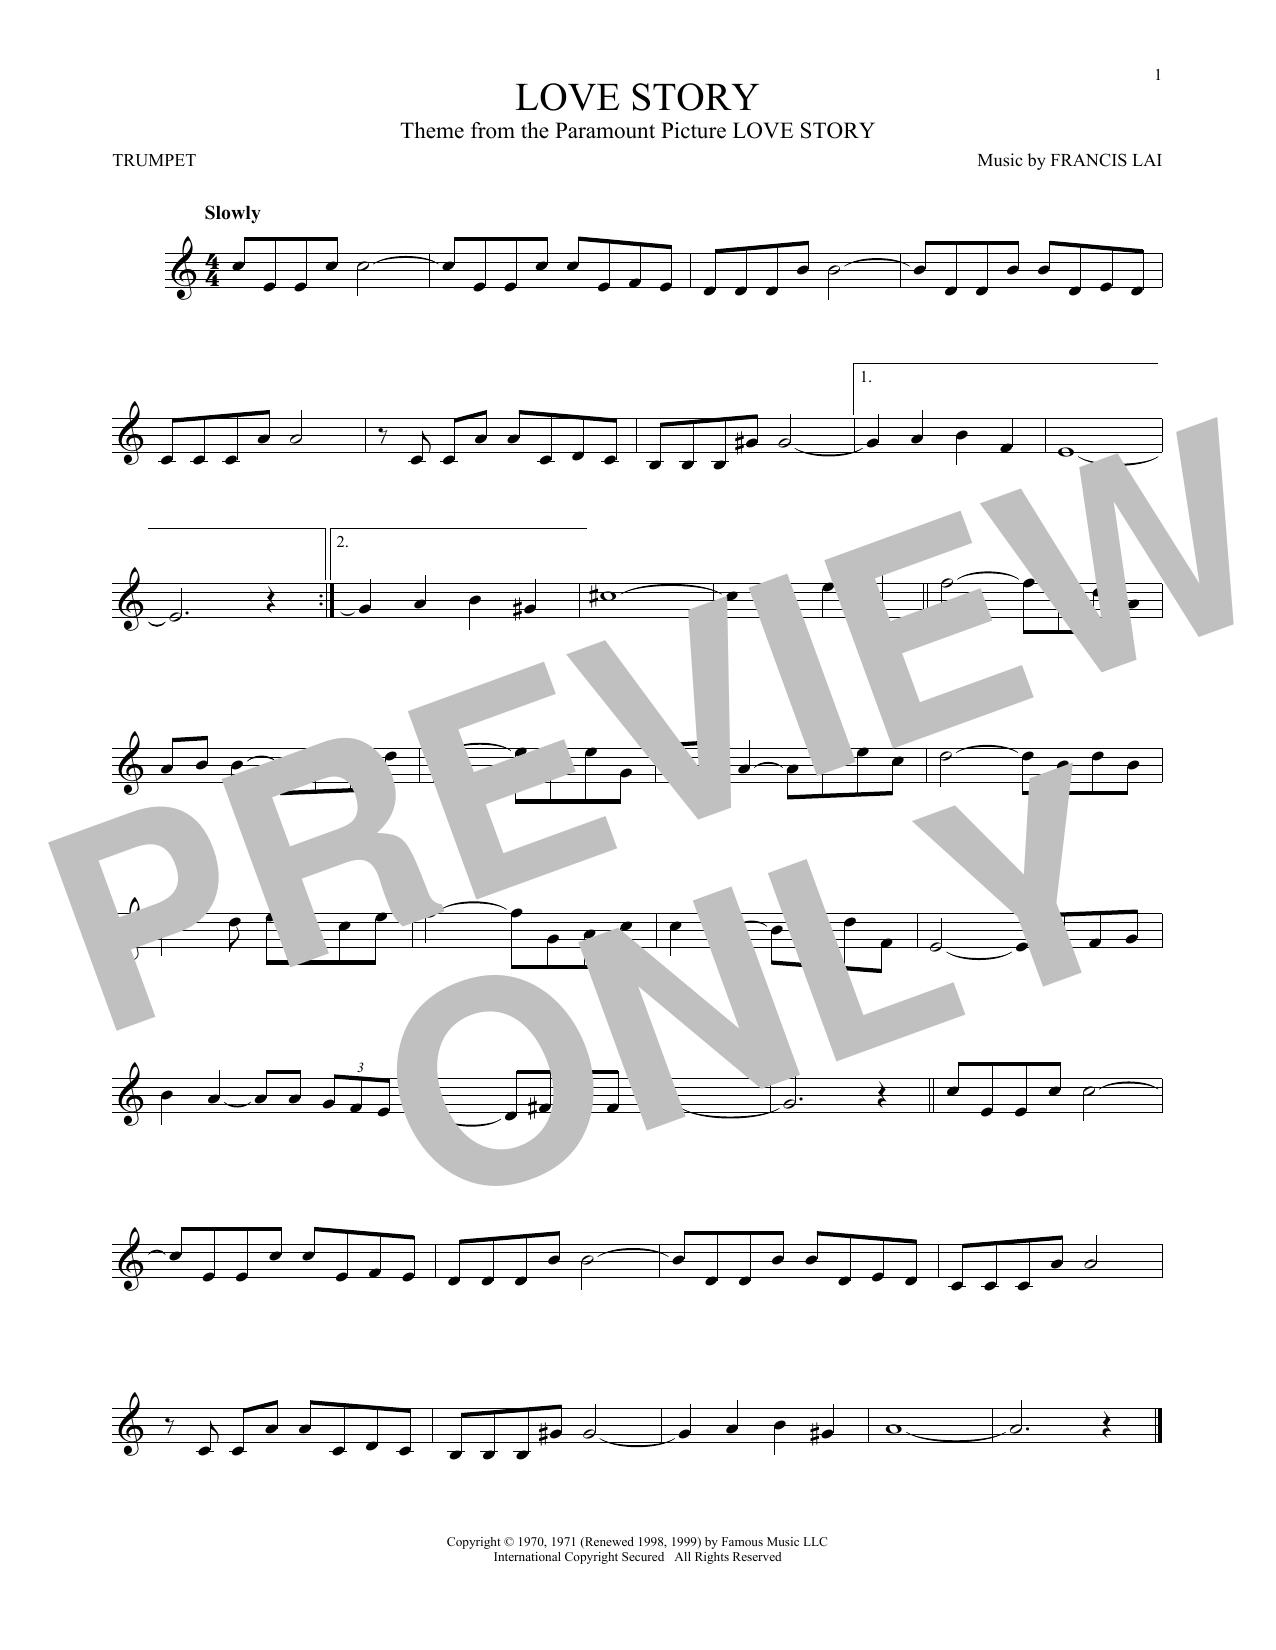 Francis Lai 'Love Story' Sheet Music Notes, Chords   Download Printable  Trumpet - SKU: 168799